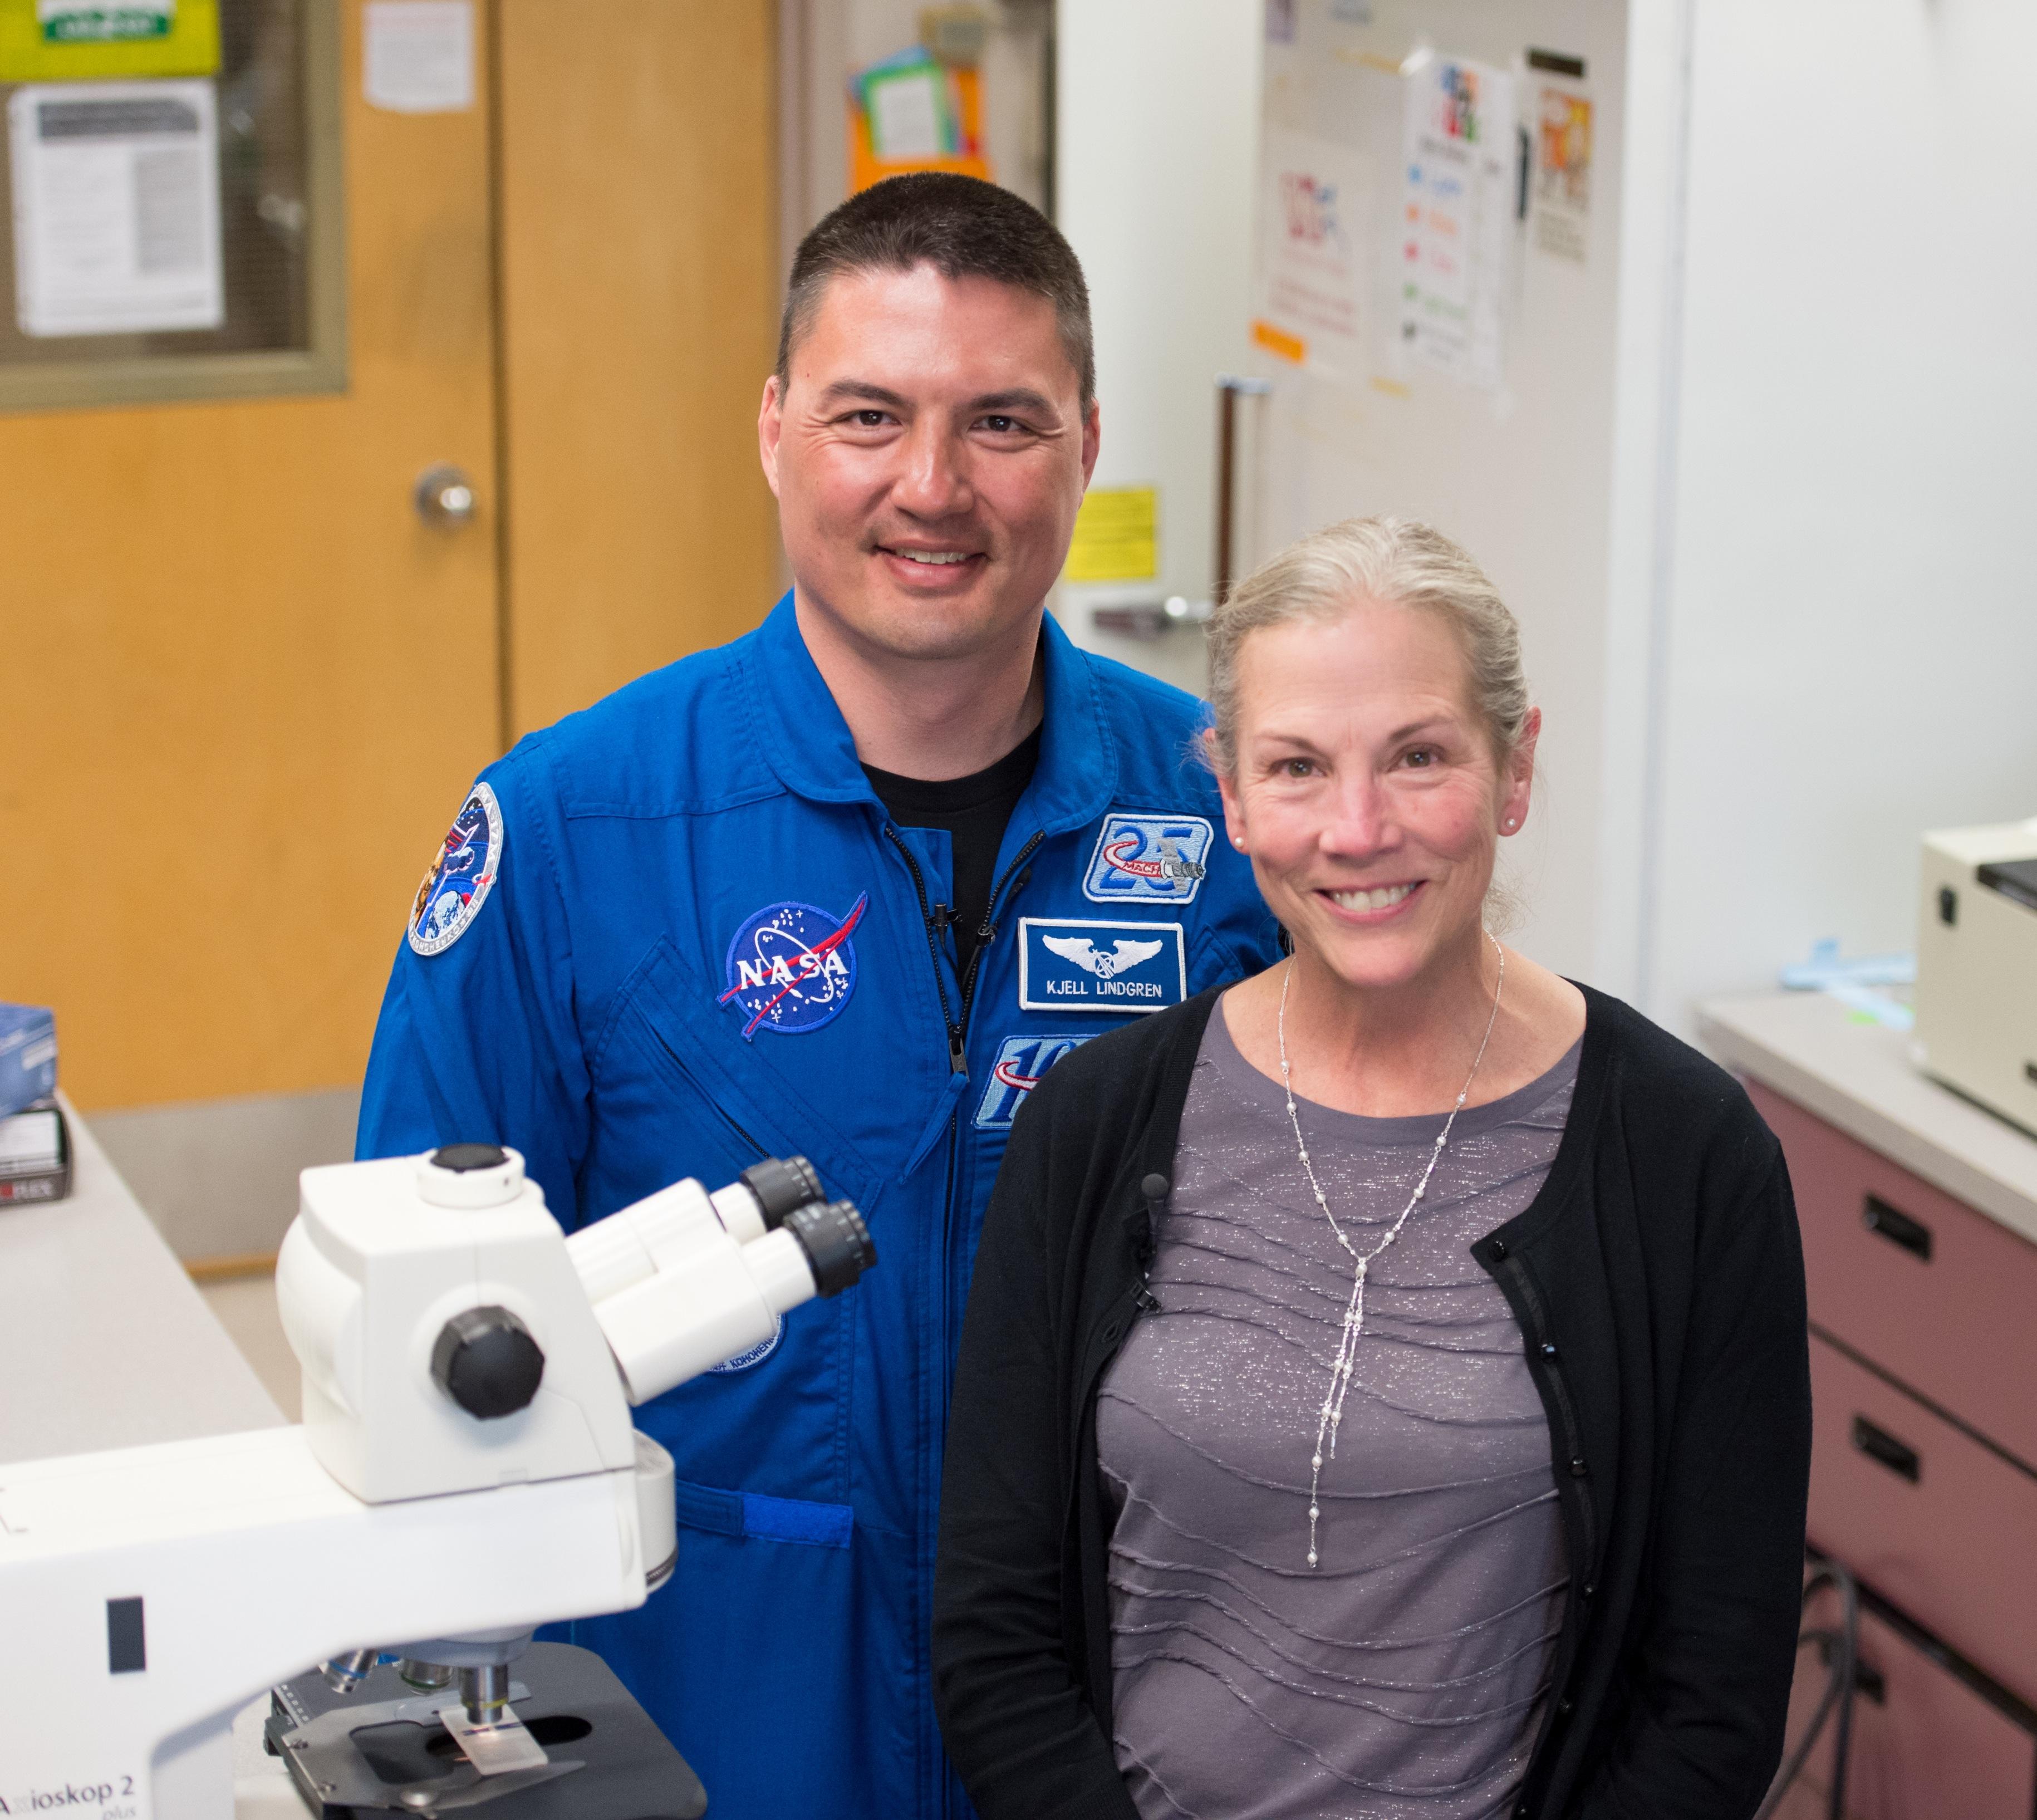 qPCR – A Lab Aloft (International Space Station Research)